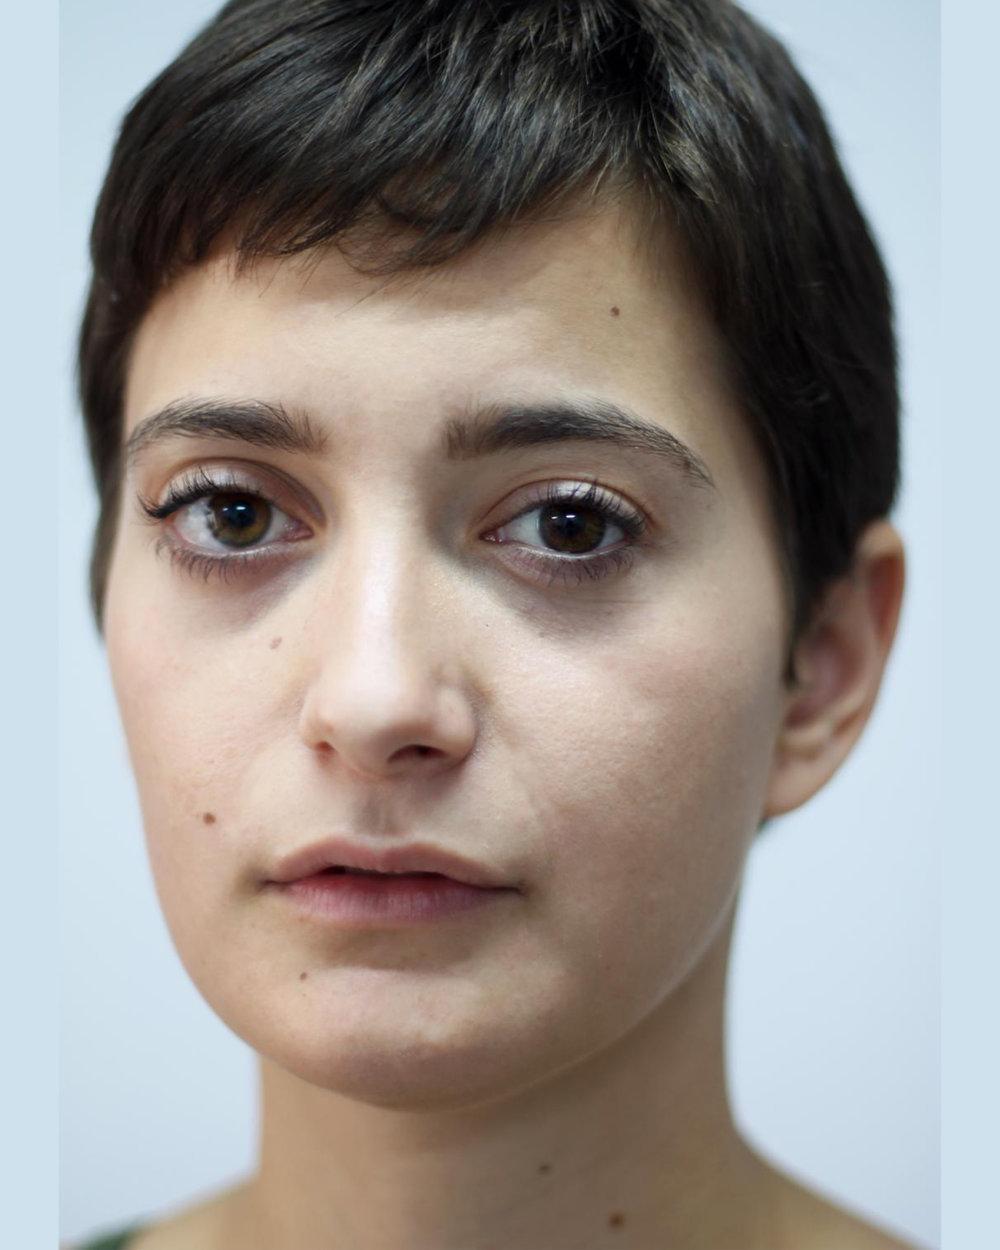 Guillem, Lidia Headshot.jpg